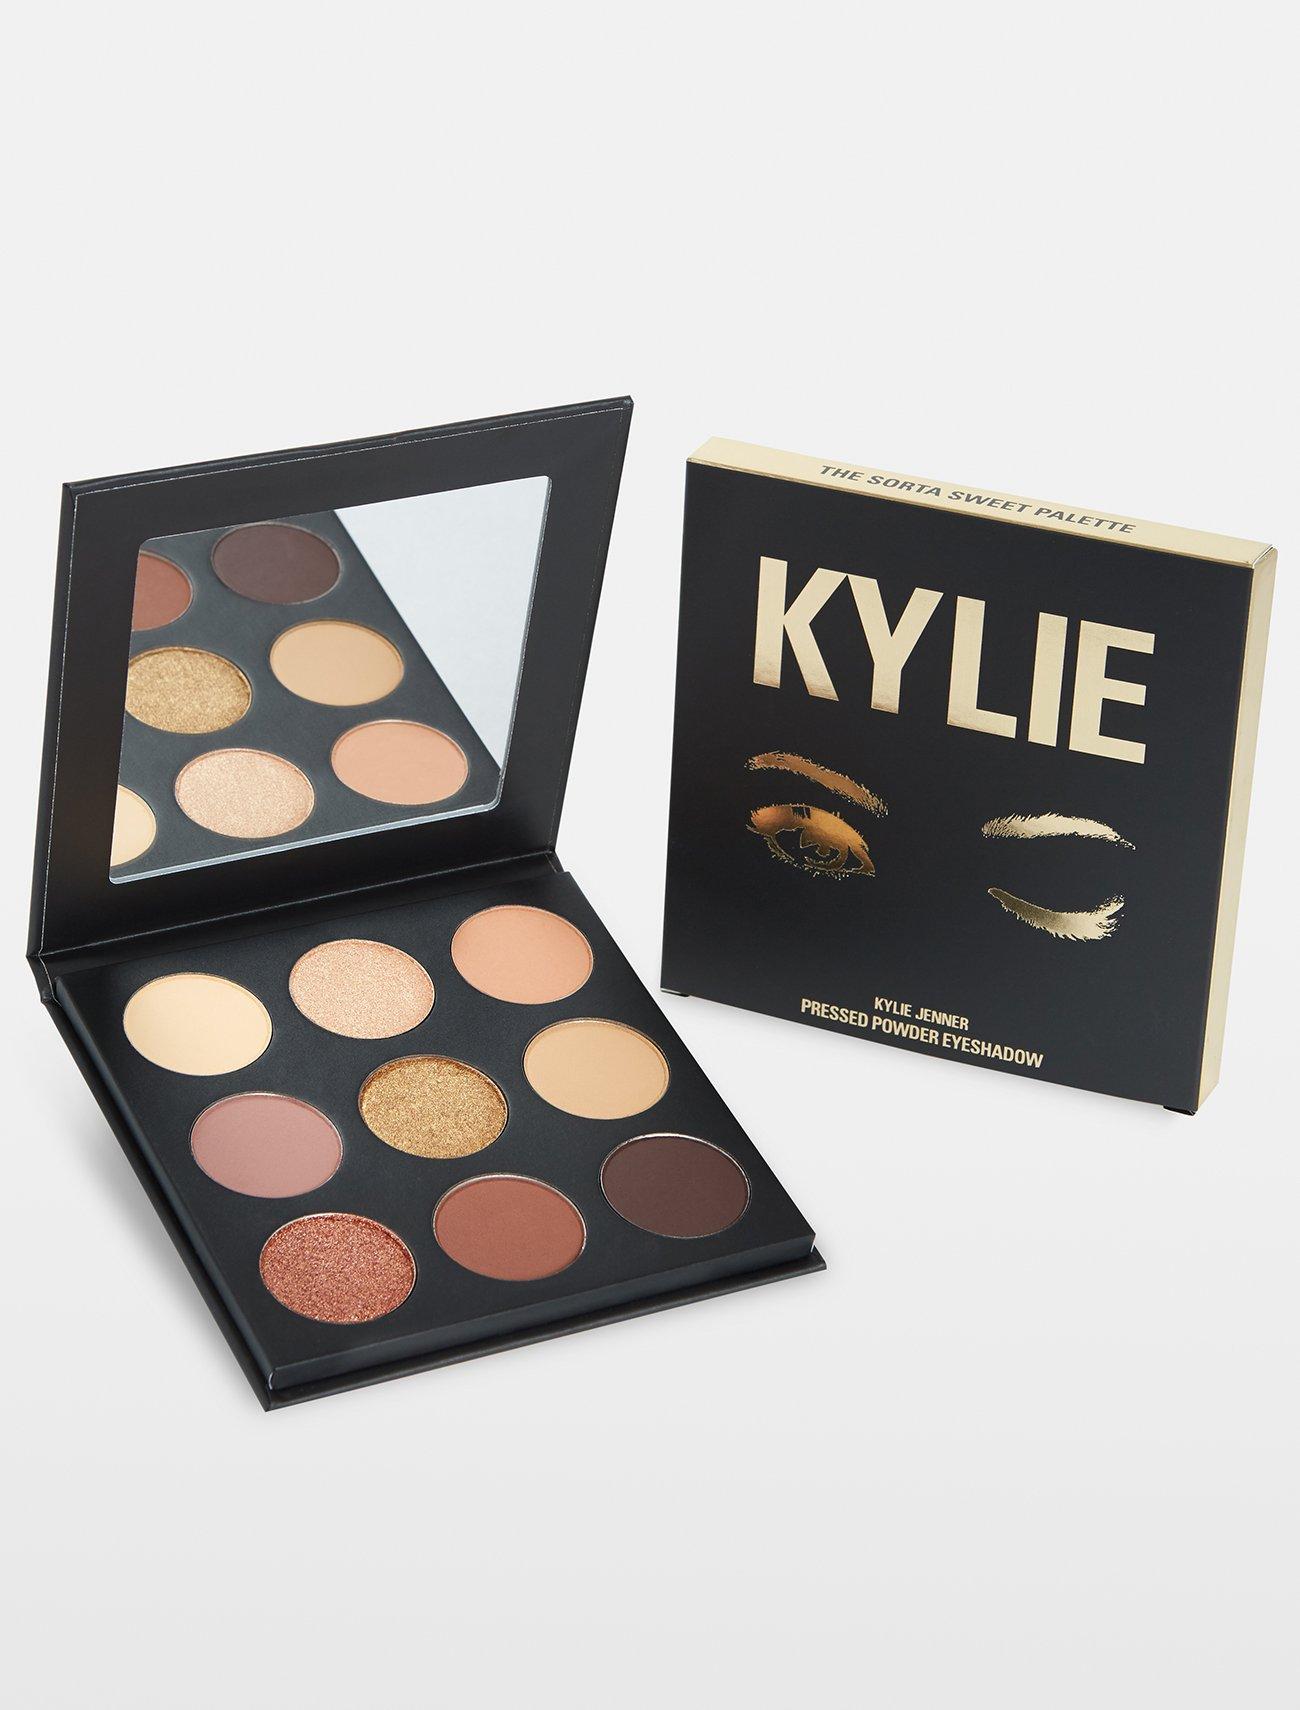 Kylie Cosmetics The Sorta Sweet Palette Kyshadow